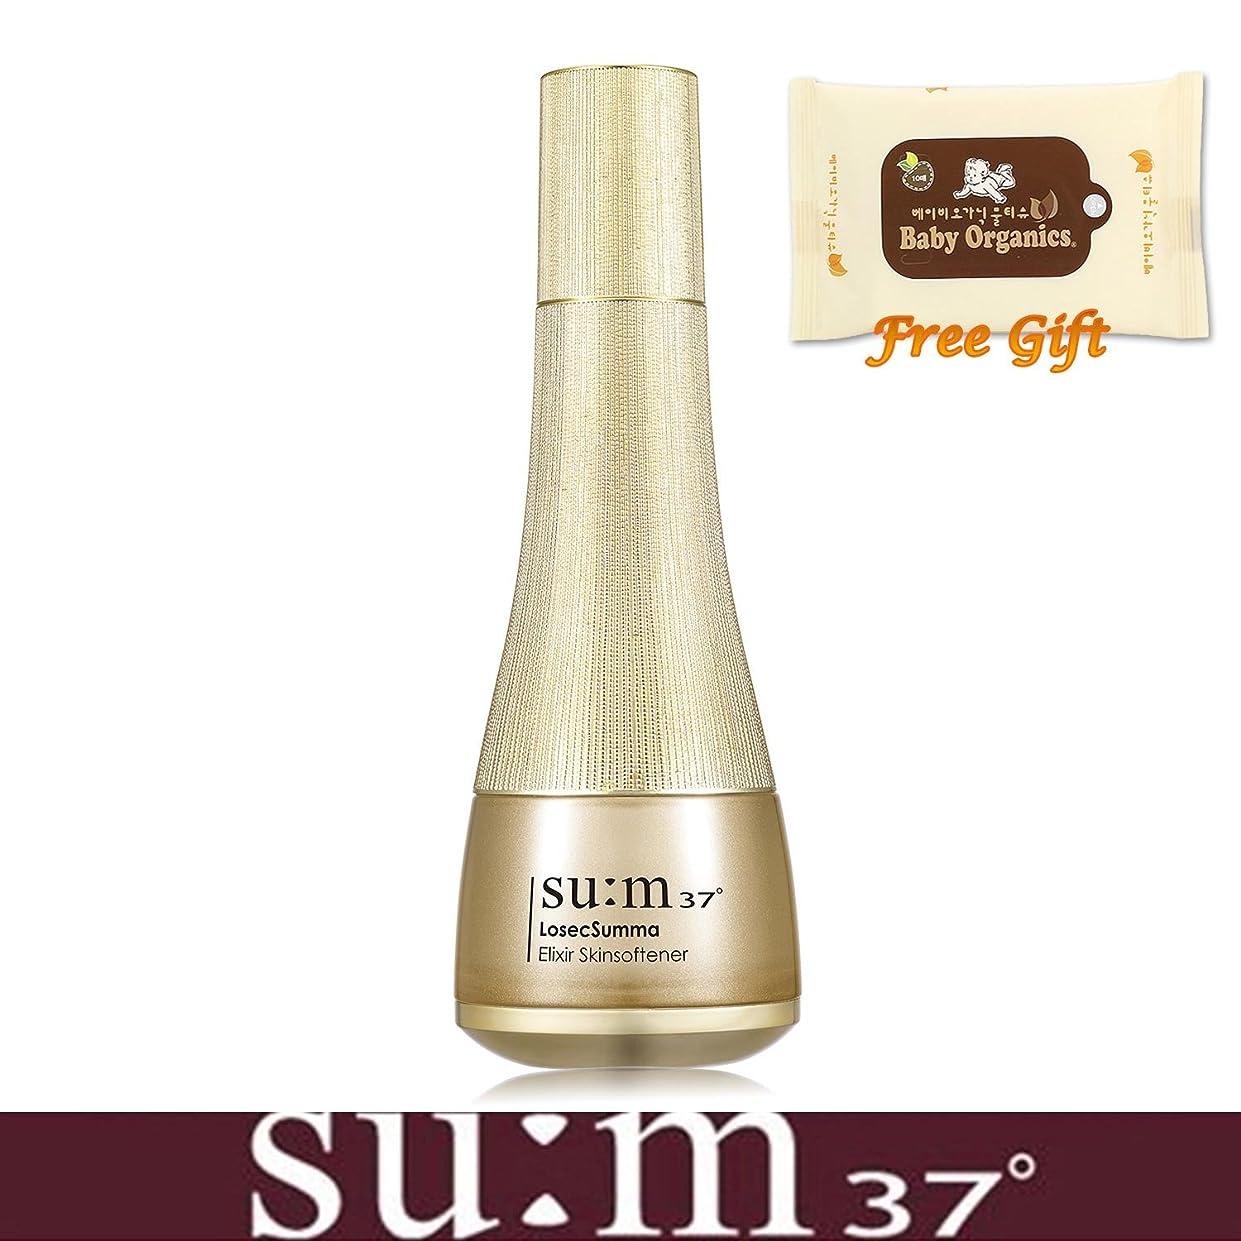 [su:m37/スム37°] Sum 37 LOSEC SUMMA ELIXIR Skin softener 150 ml+ Portable Tissue/ スム37 LOSEC SUMMA ELIXIR スキンソフトナー 150ml + [Free Gift](海外直送品)